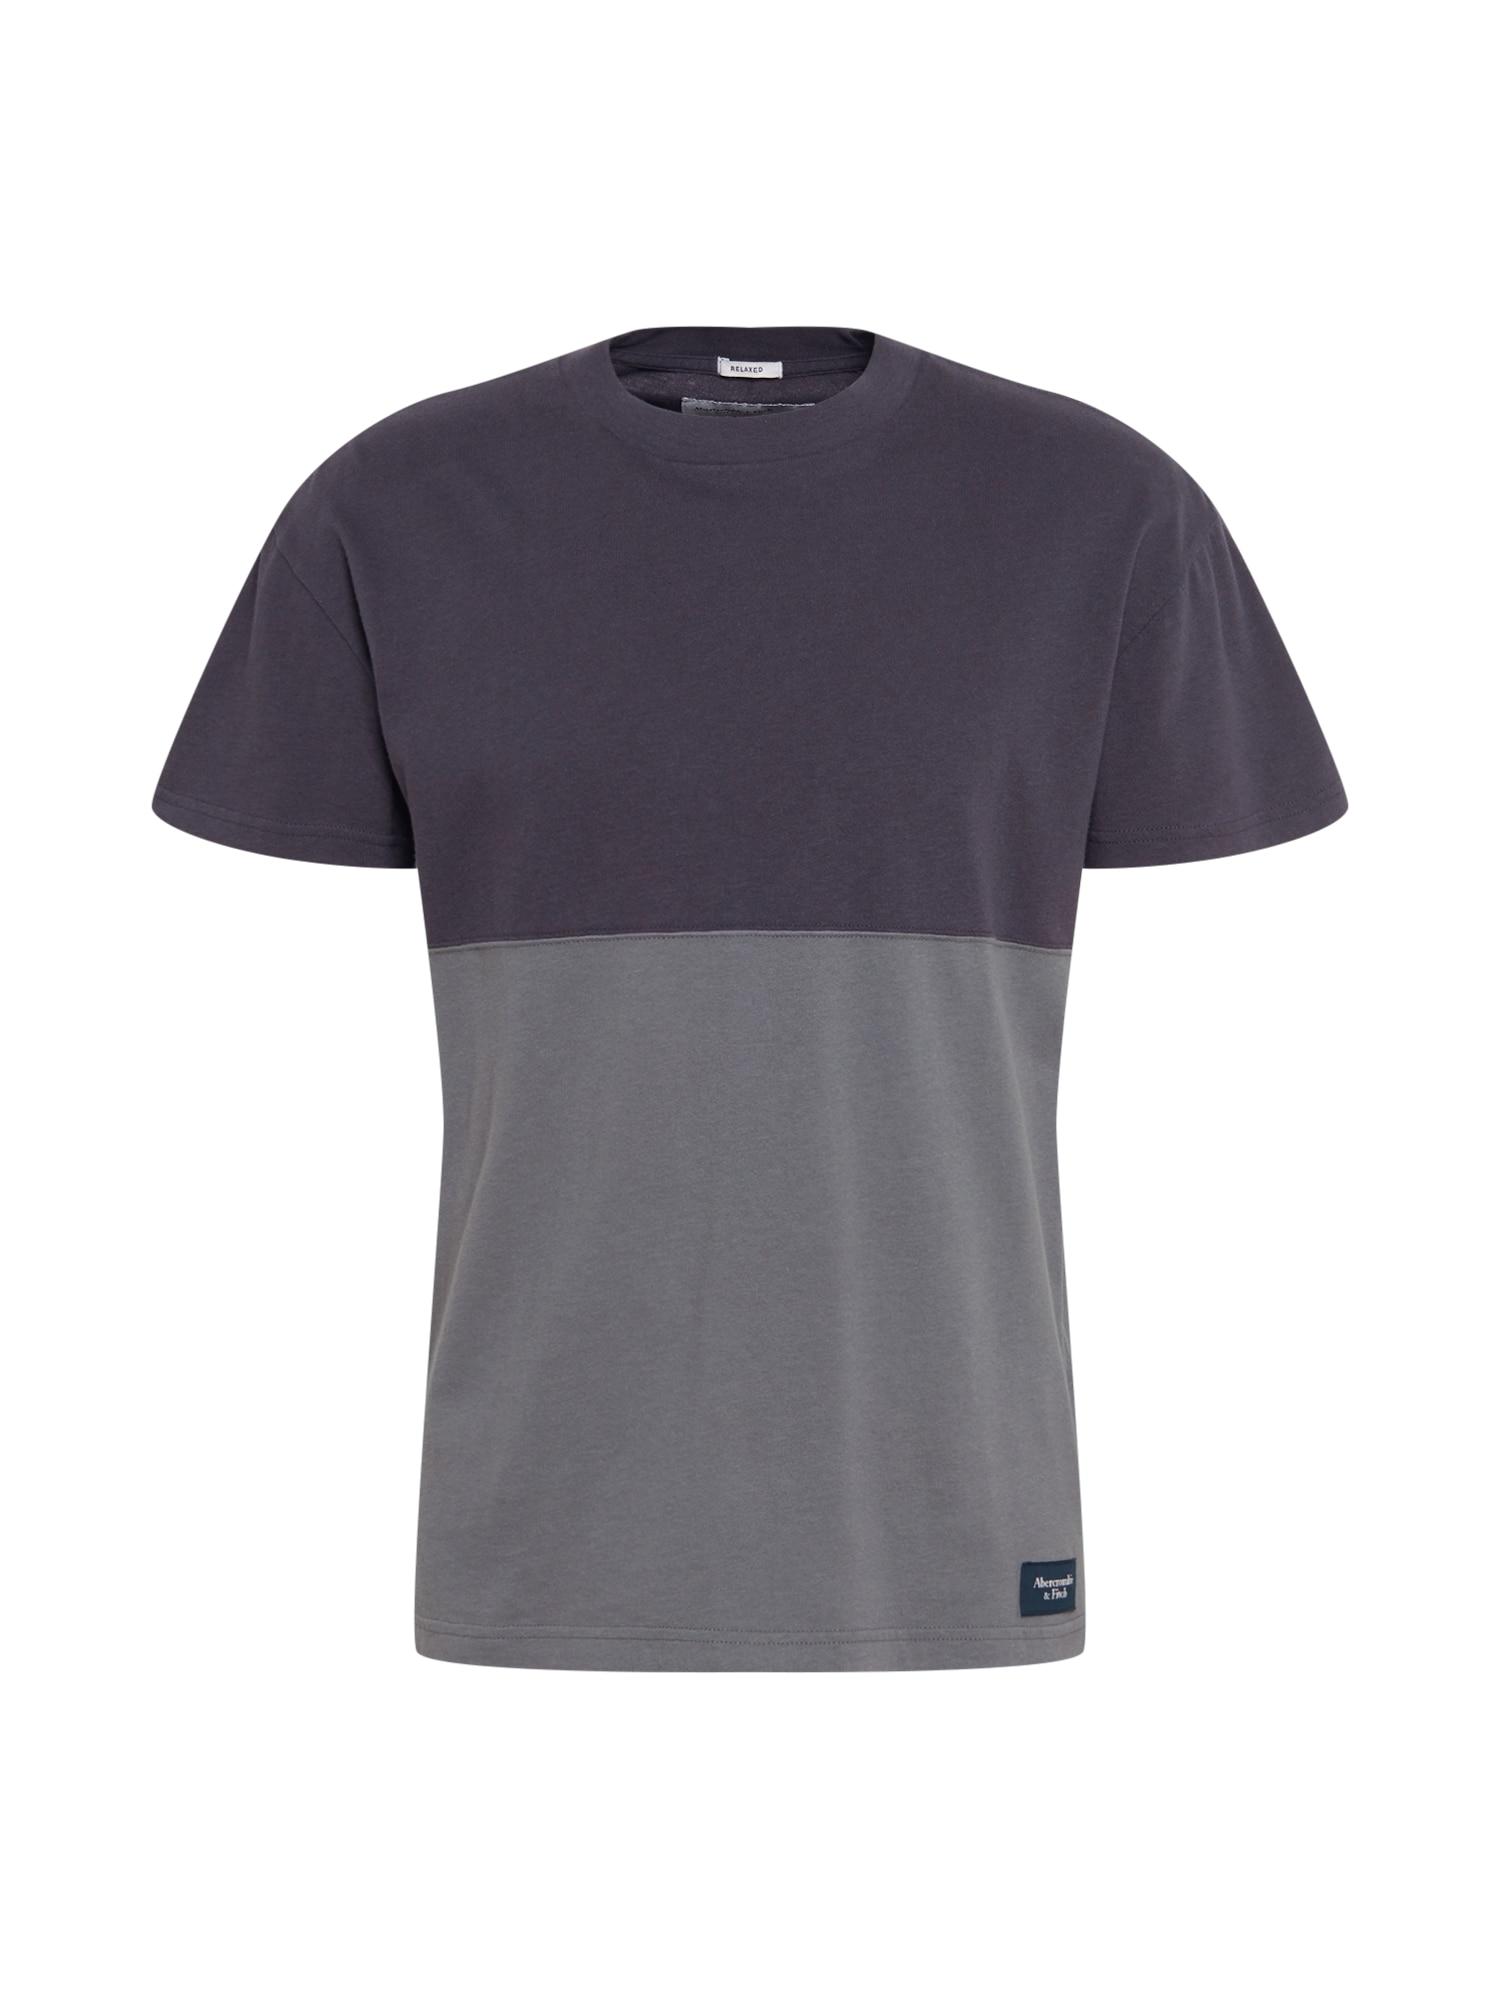 Abercrombie & Fitch Marškinėliai bazalto pilka / tamsiai pilka